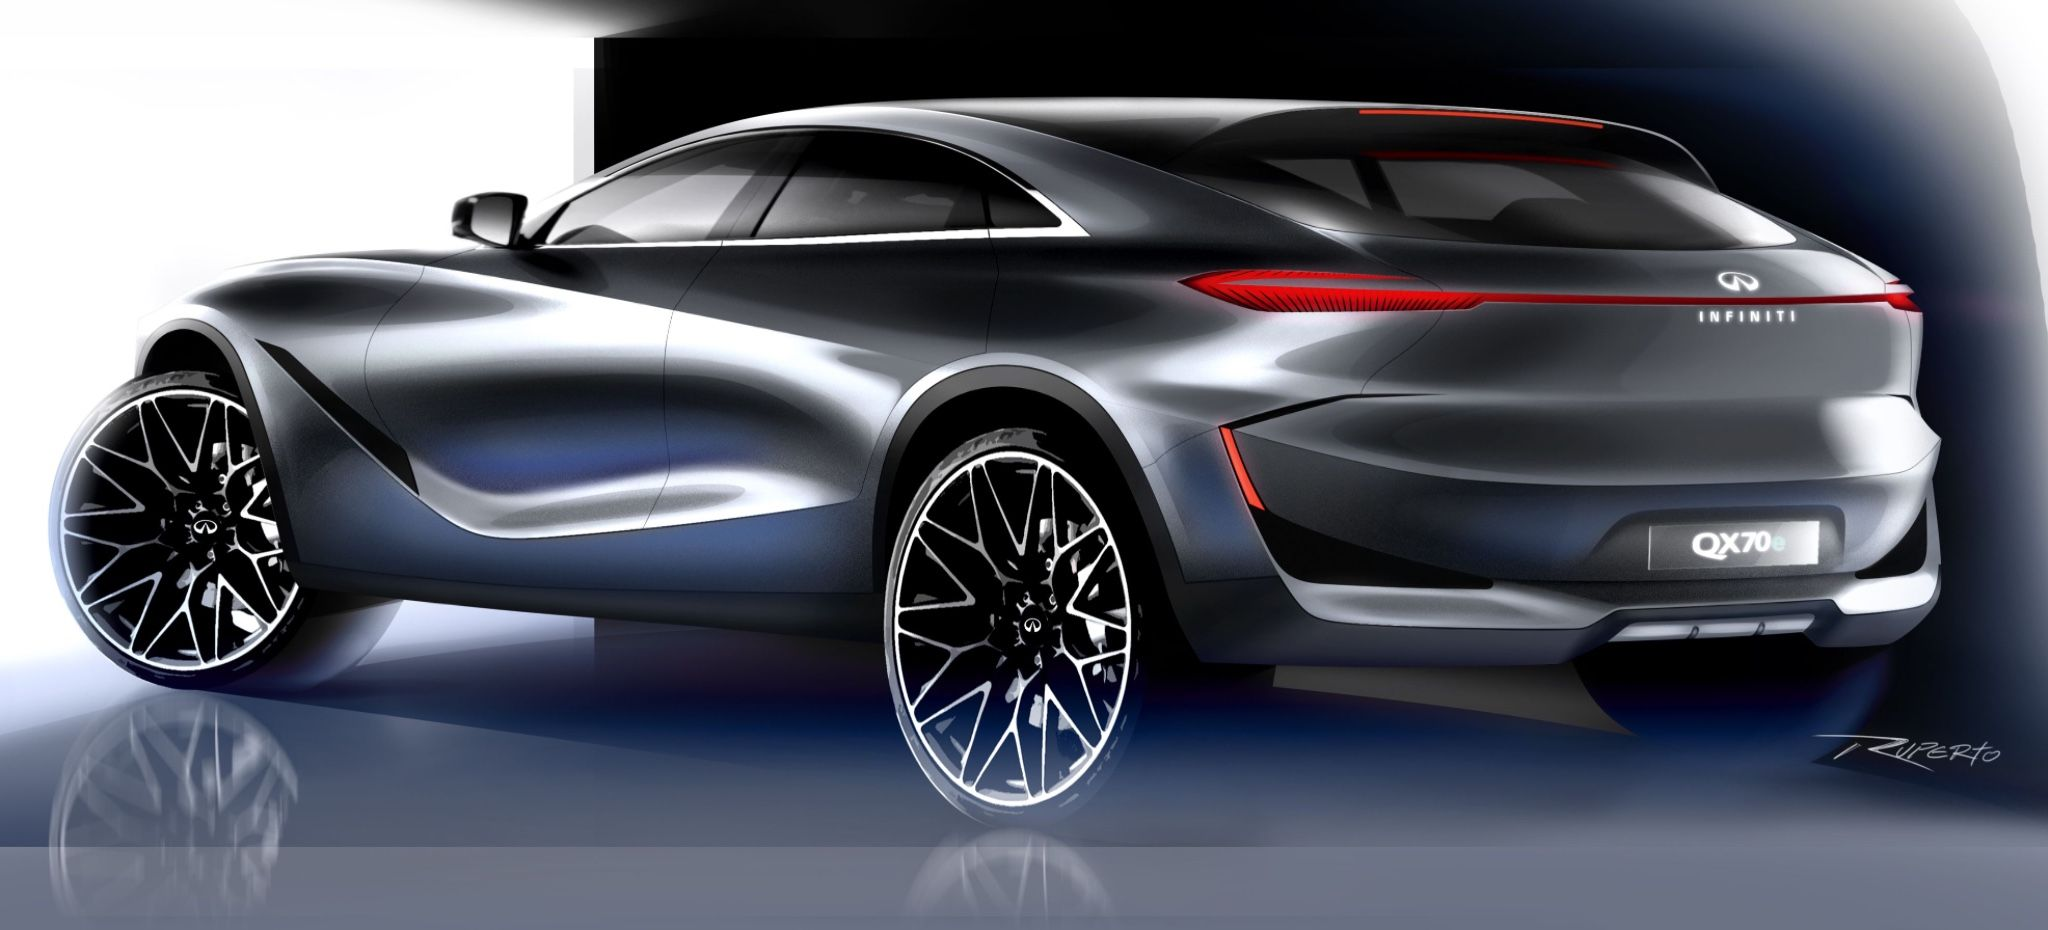 Pin de Saad Sultan em Car design Auto